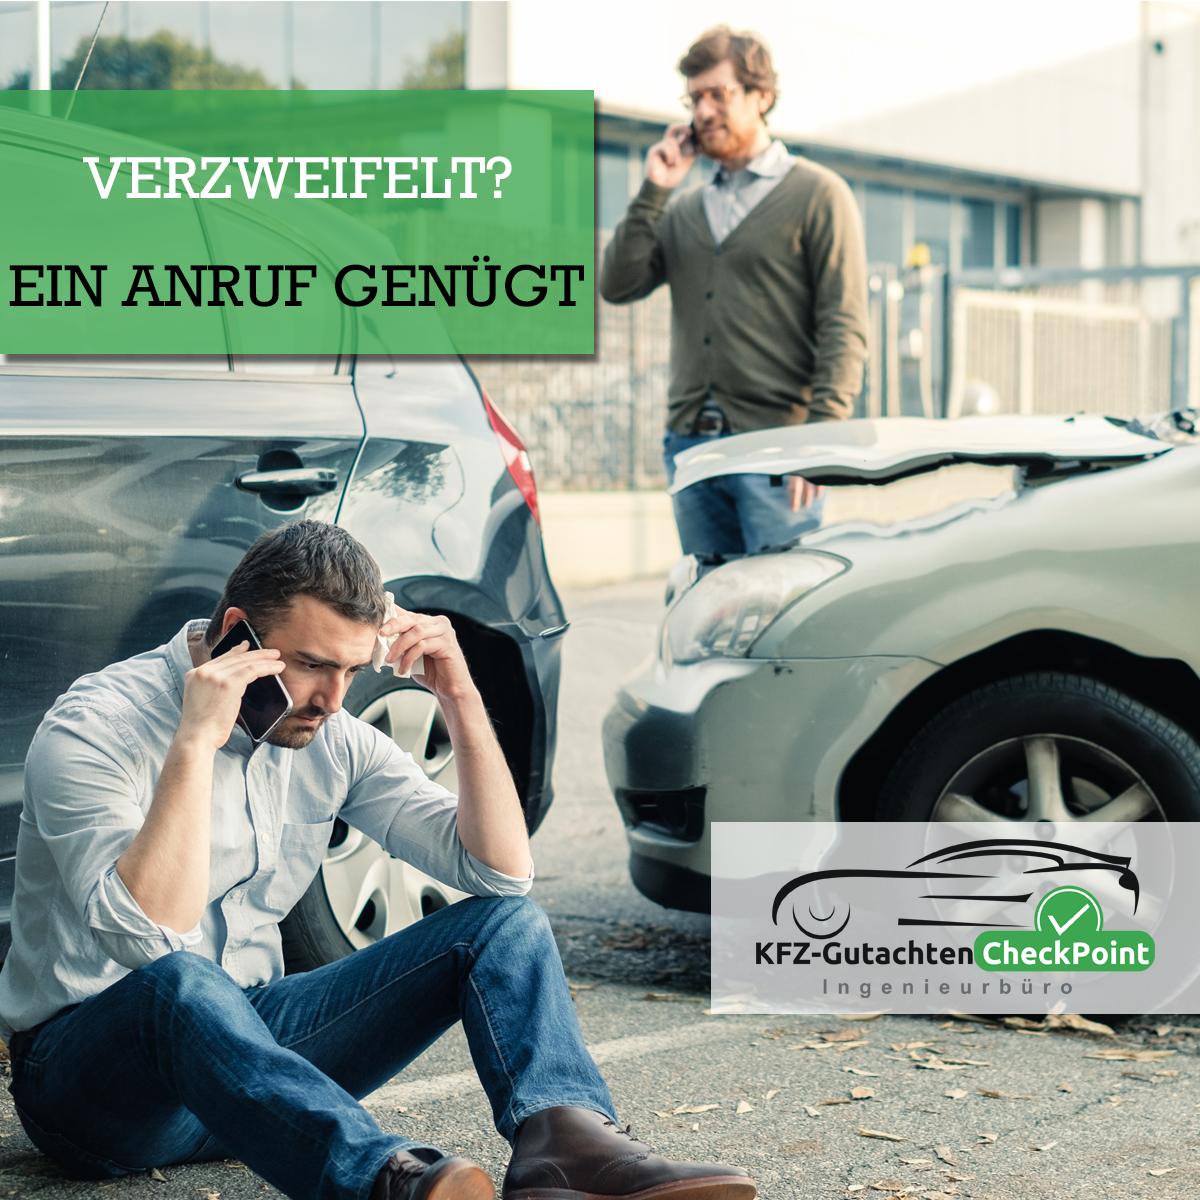 KFZ Gutachten CheckPoint